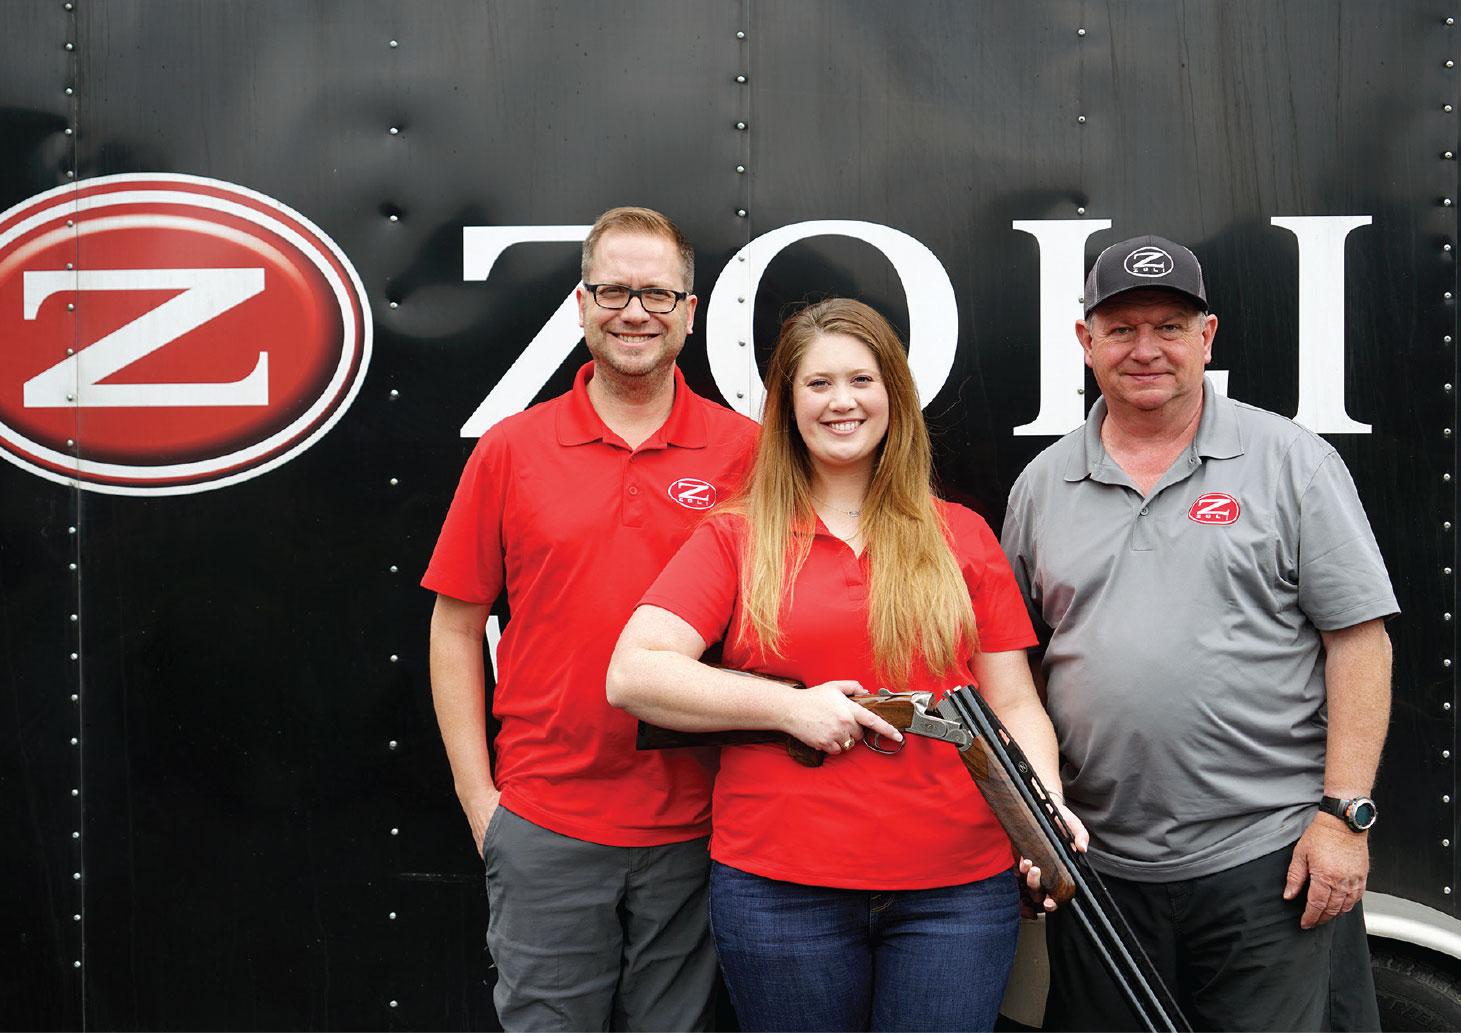 """Elite Shotguns And Zoli USA Team Up With Pro Shooter Bailey Glenewinkle"""